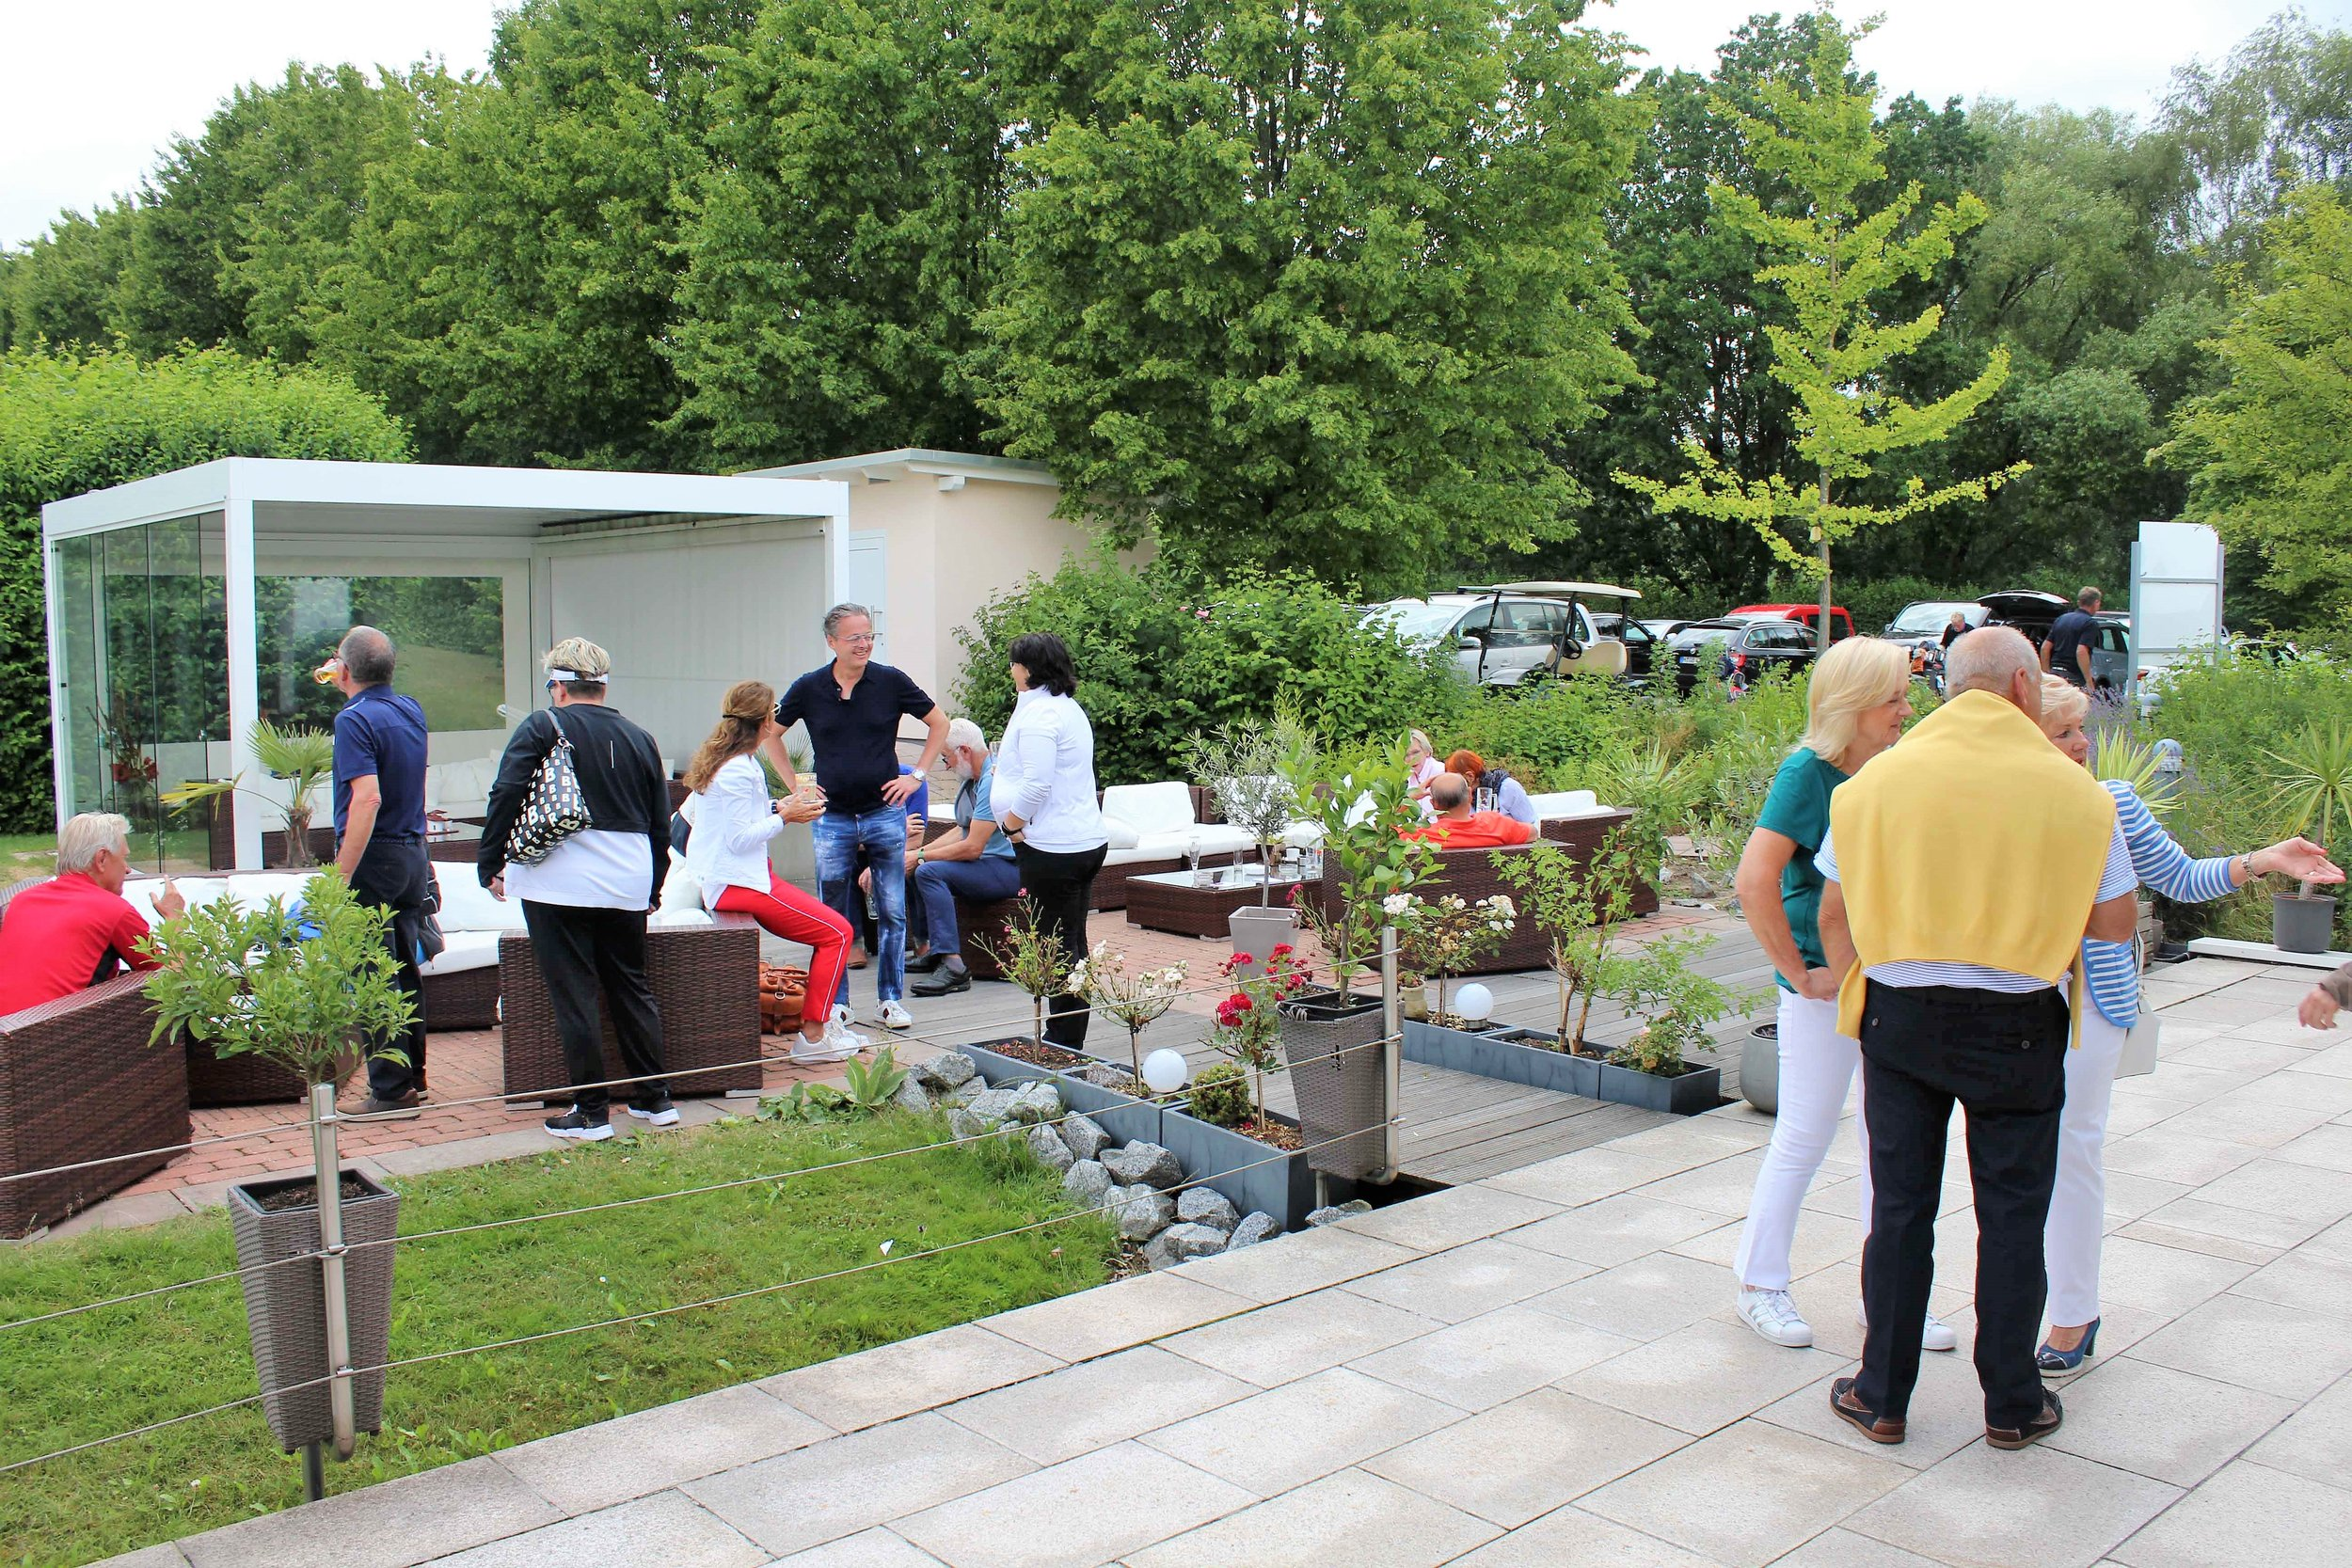 IMG_6092 2019-07-14 Monatsbecher Odenwald.jpg